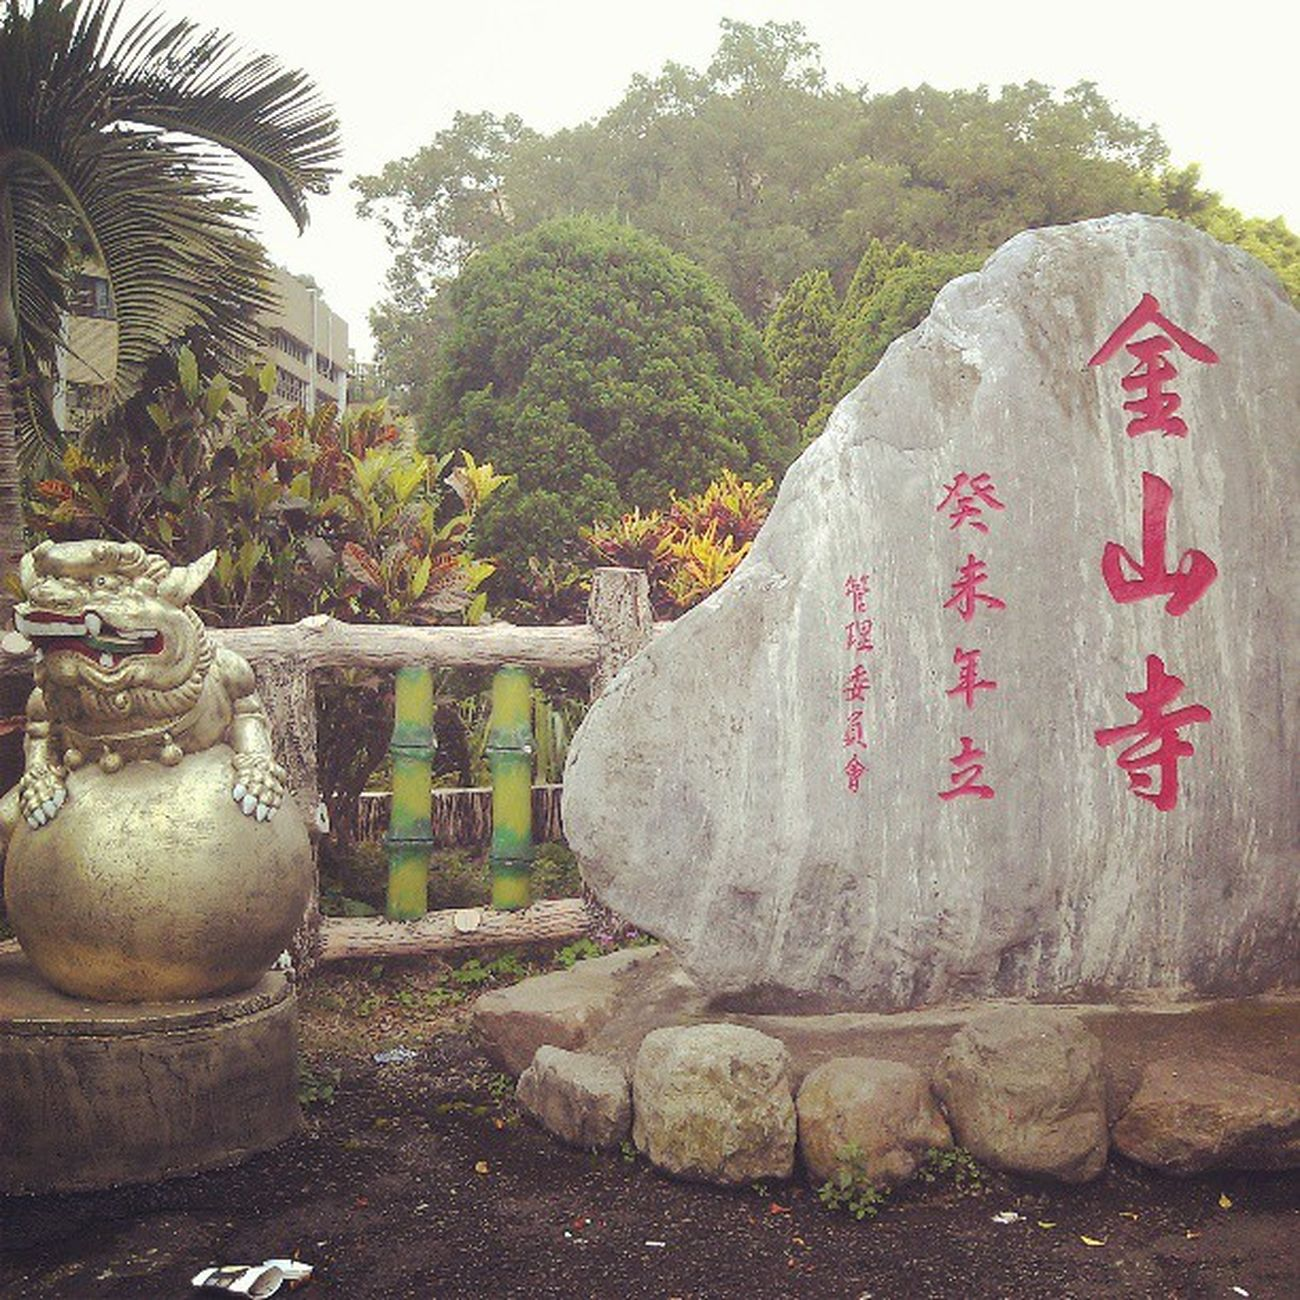 基地 大 科學園區 Site SciencePark Big 開台金山寺 古蹟 Historicalsites